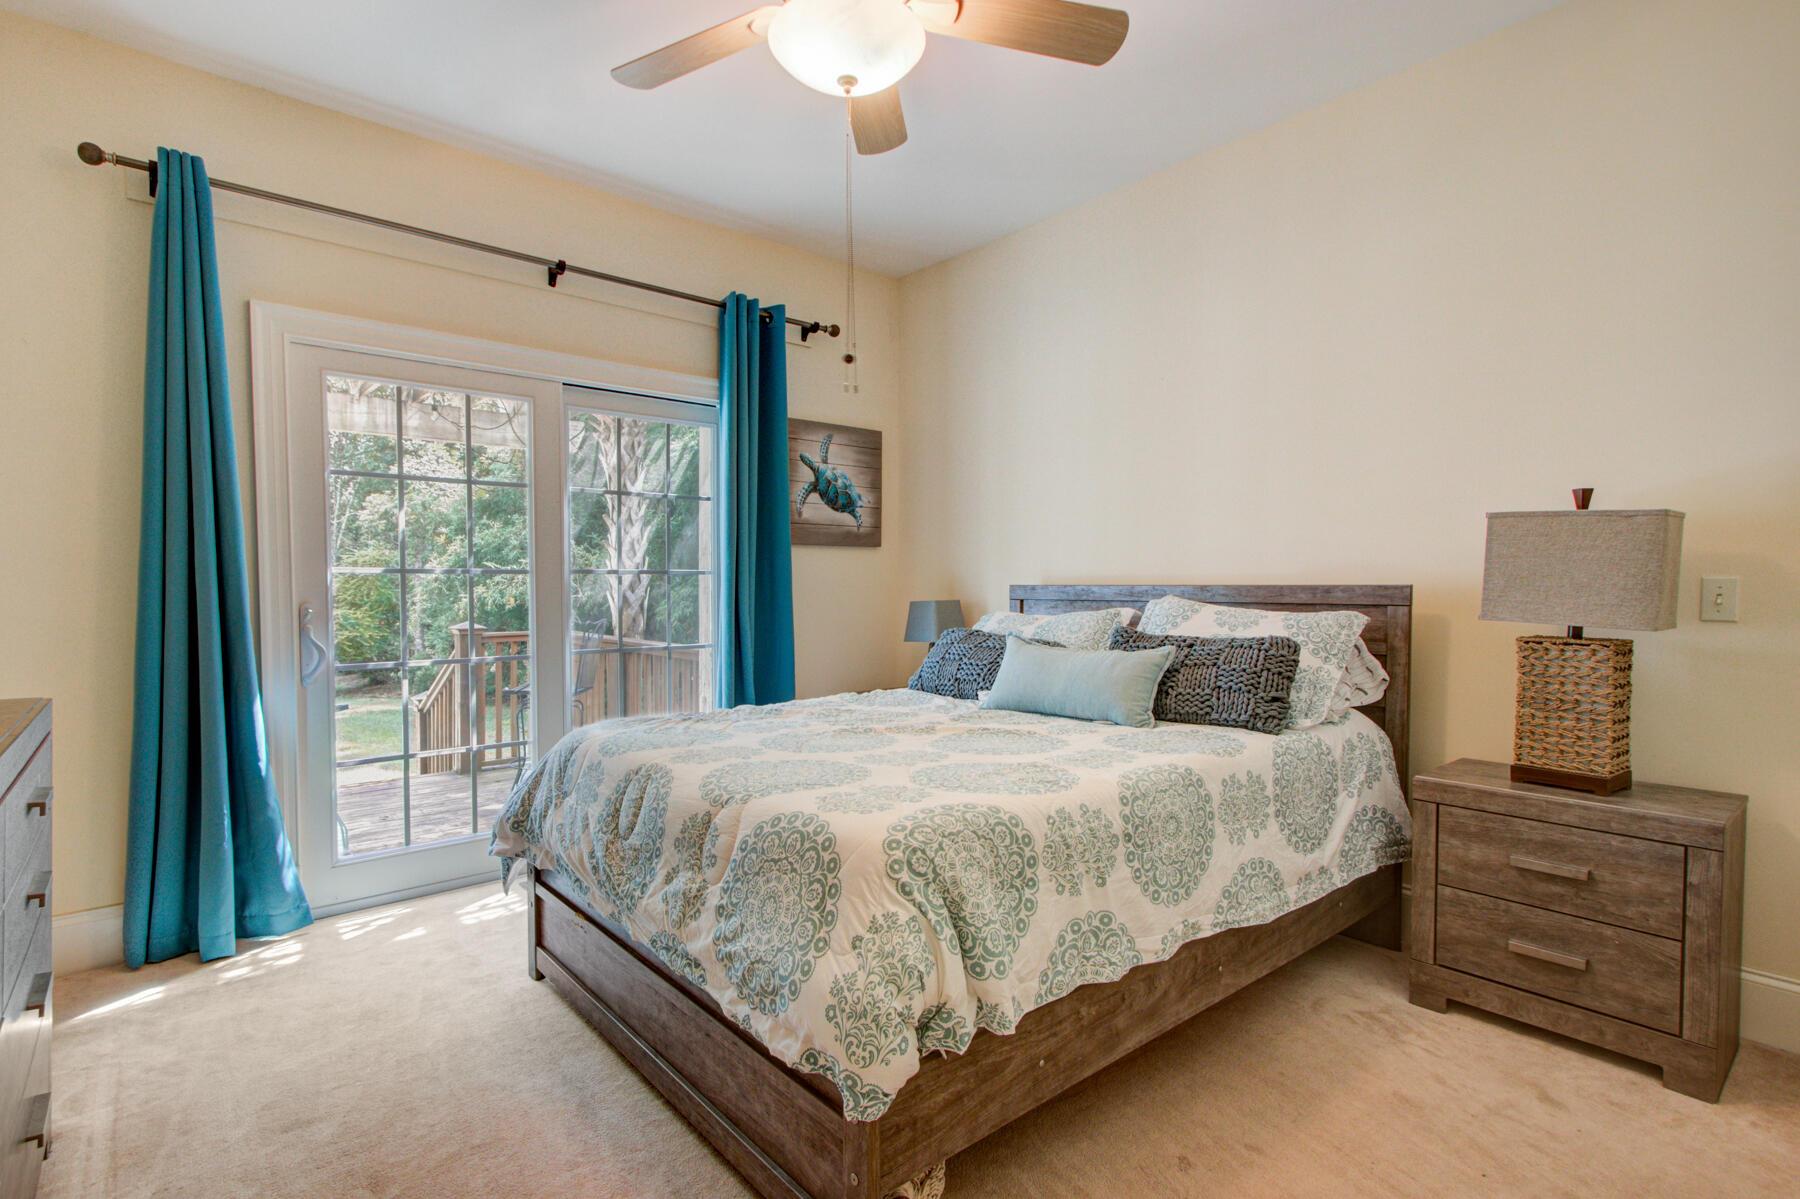 Dunes West Homes For Sale - 3095 Pignatelli, Mount Pleasant, SC - 20